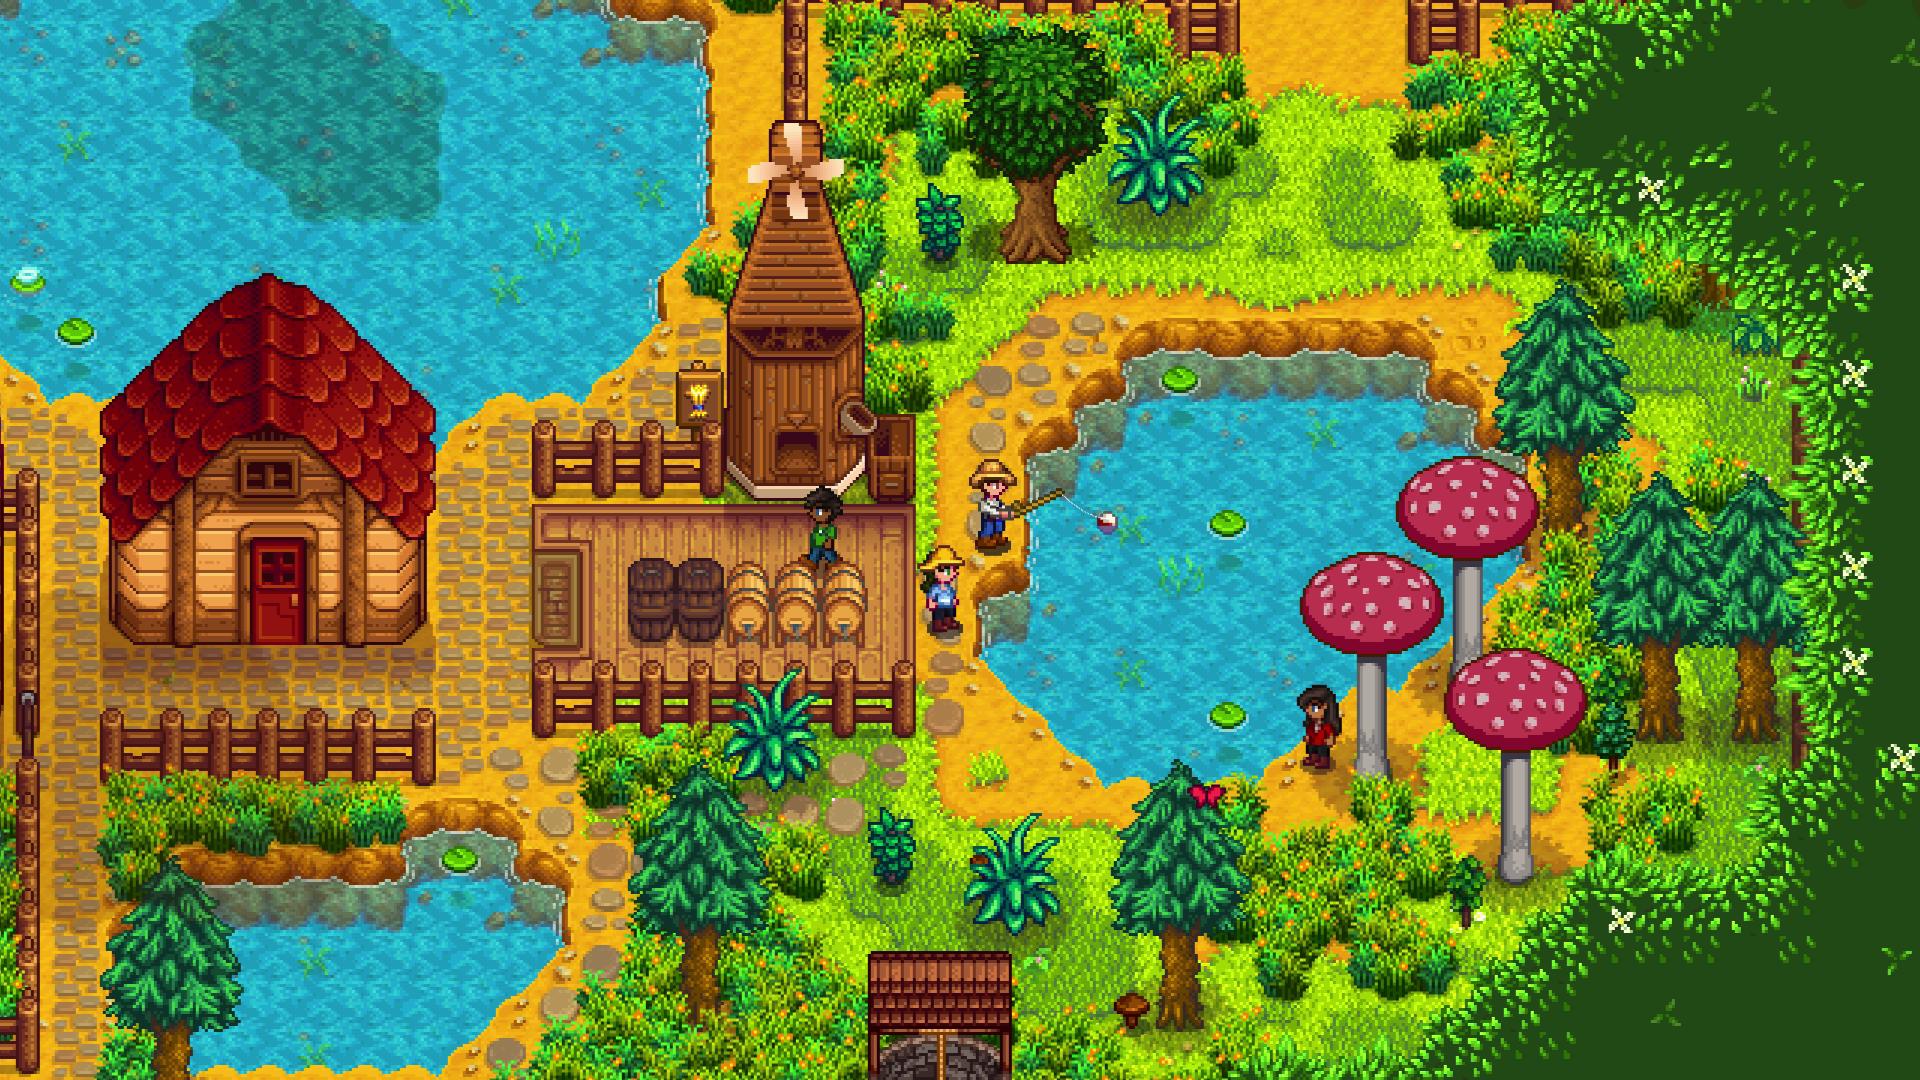 Players enjoy Stardew Valley's multiplayer mode